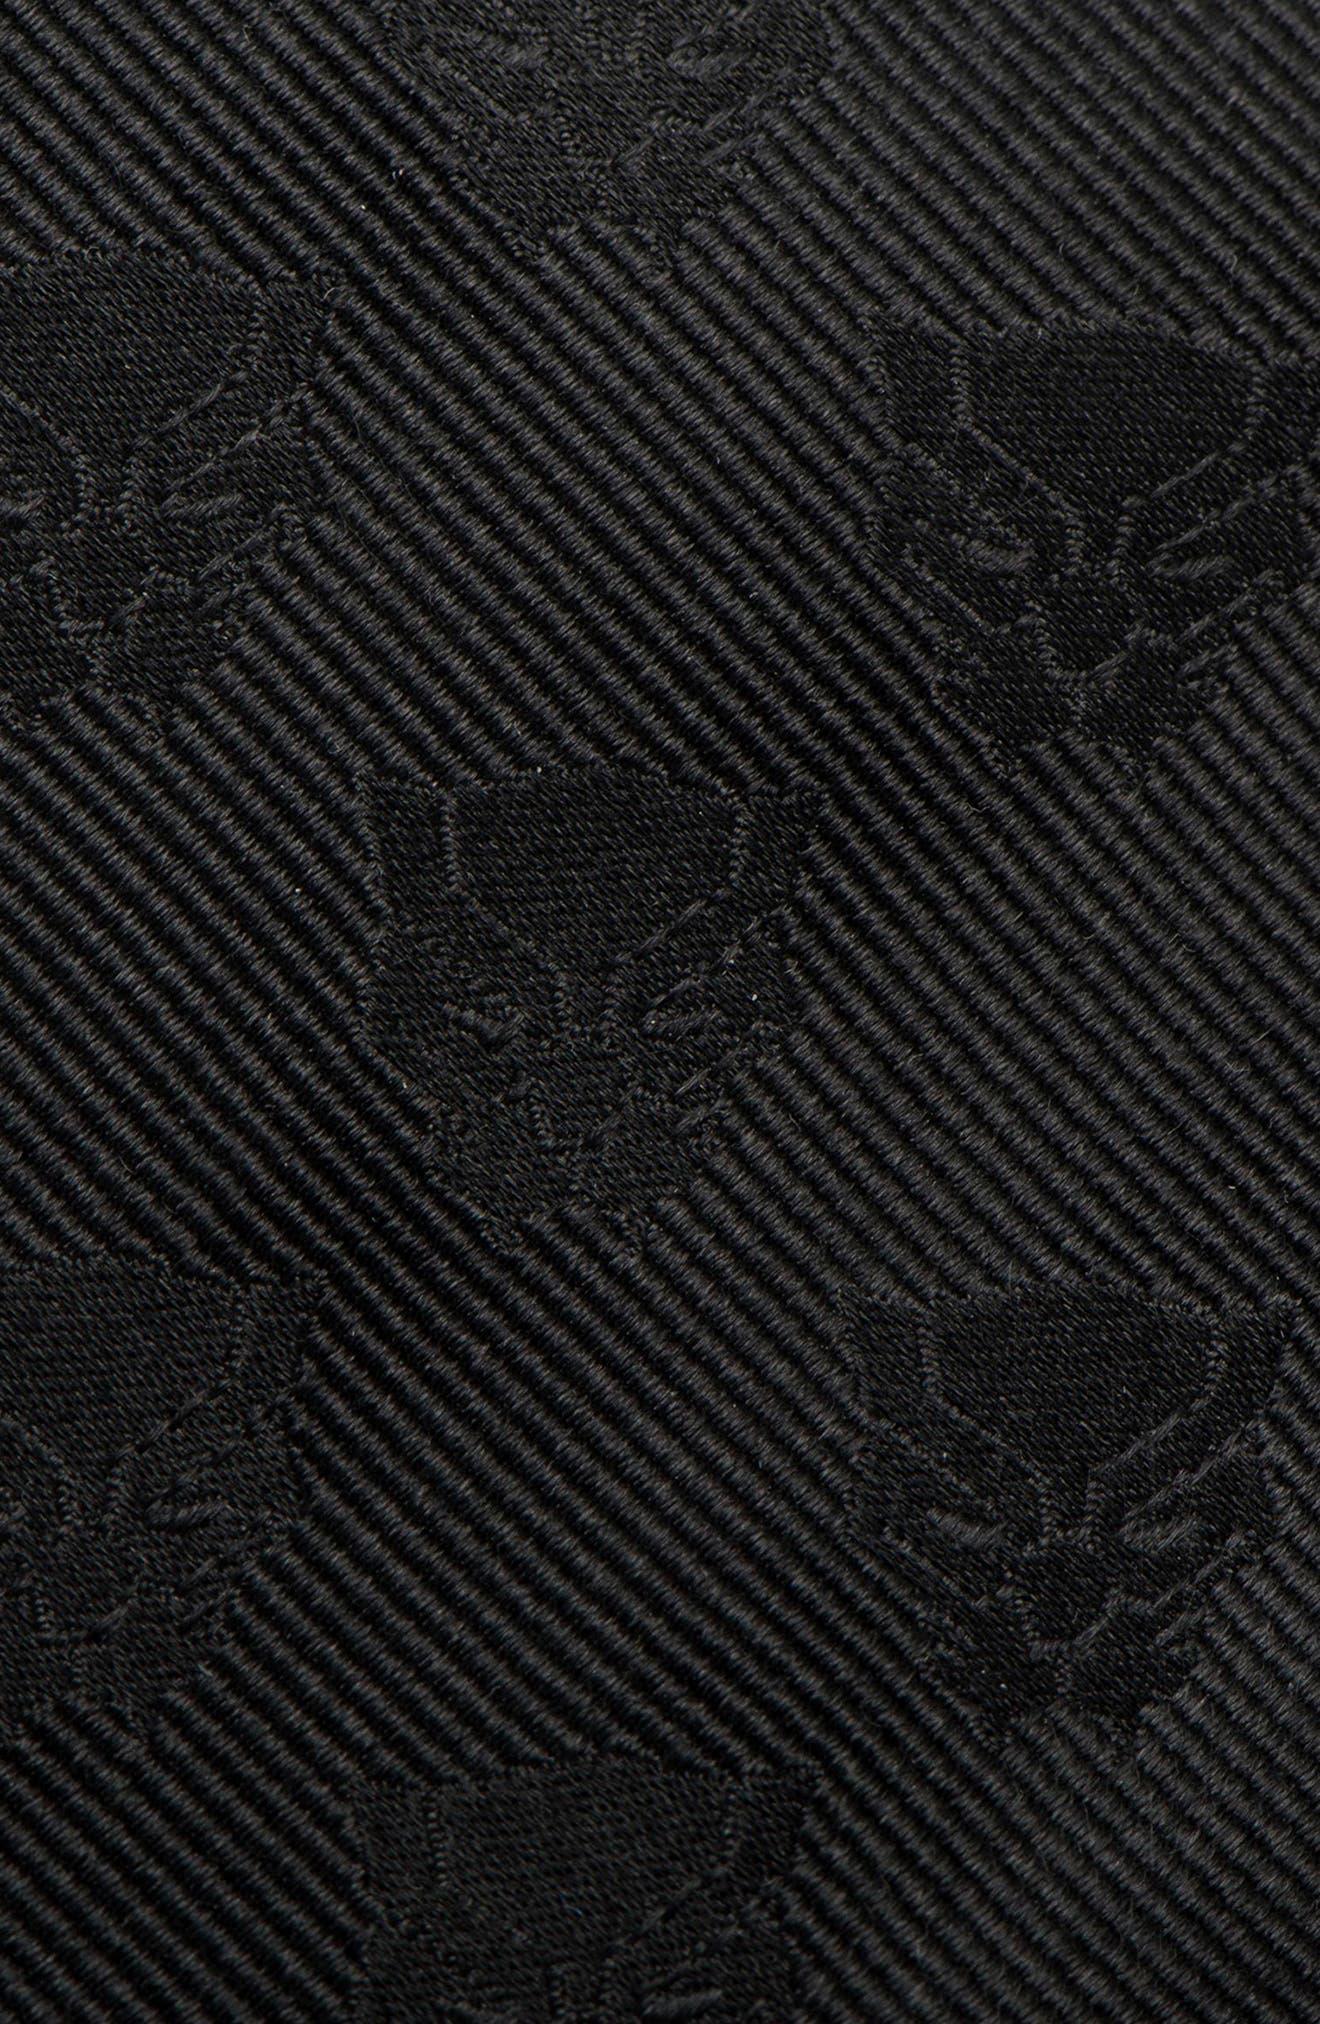 Black Panther Silk Tie,                             Alternate thumbnail 3, color,                             Black